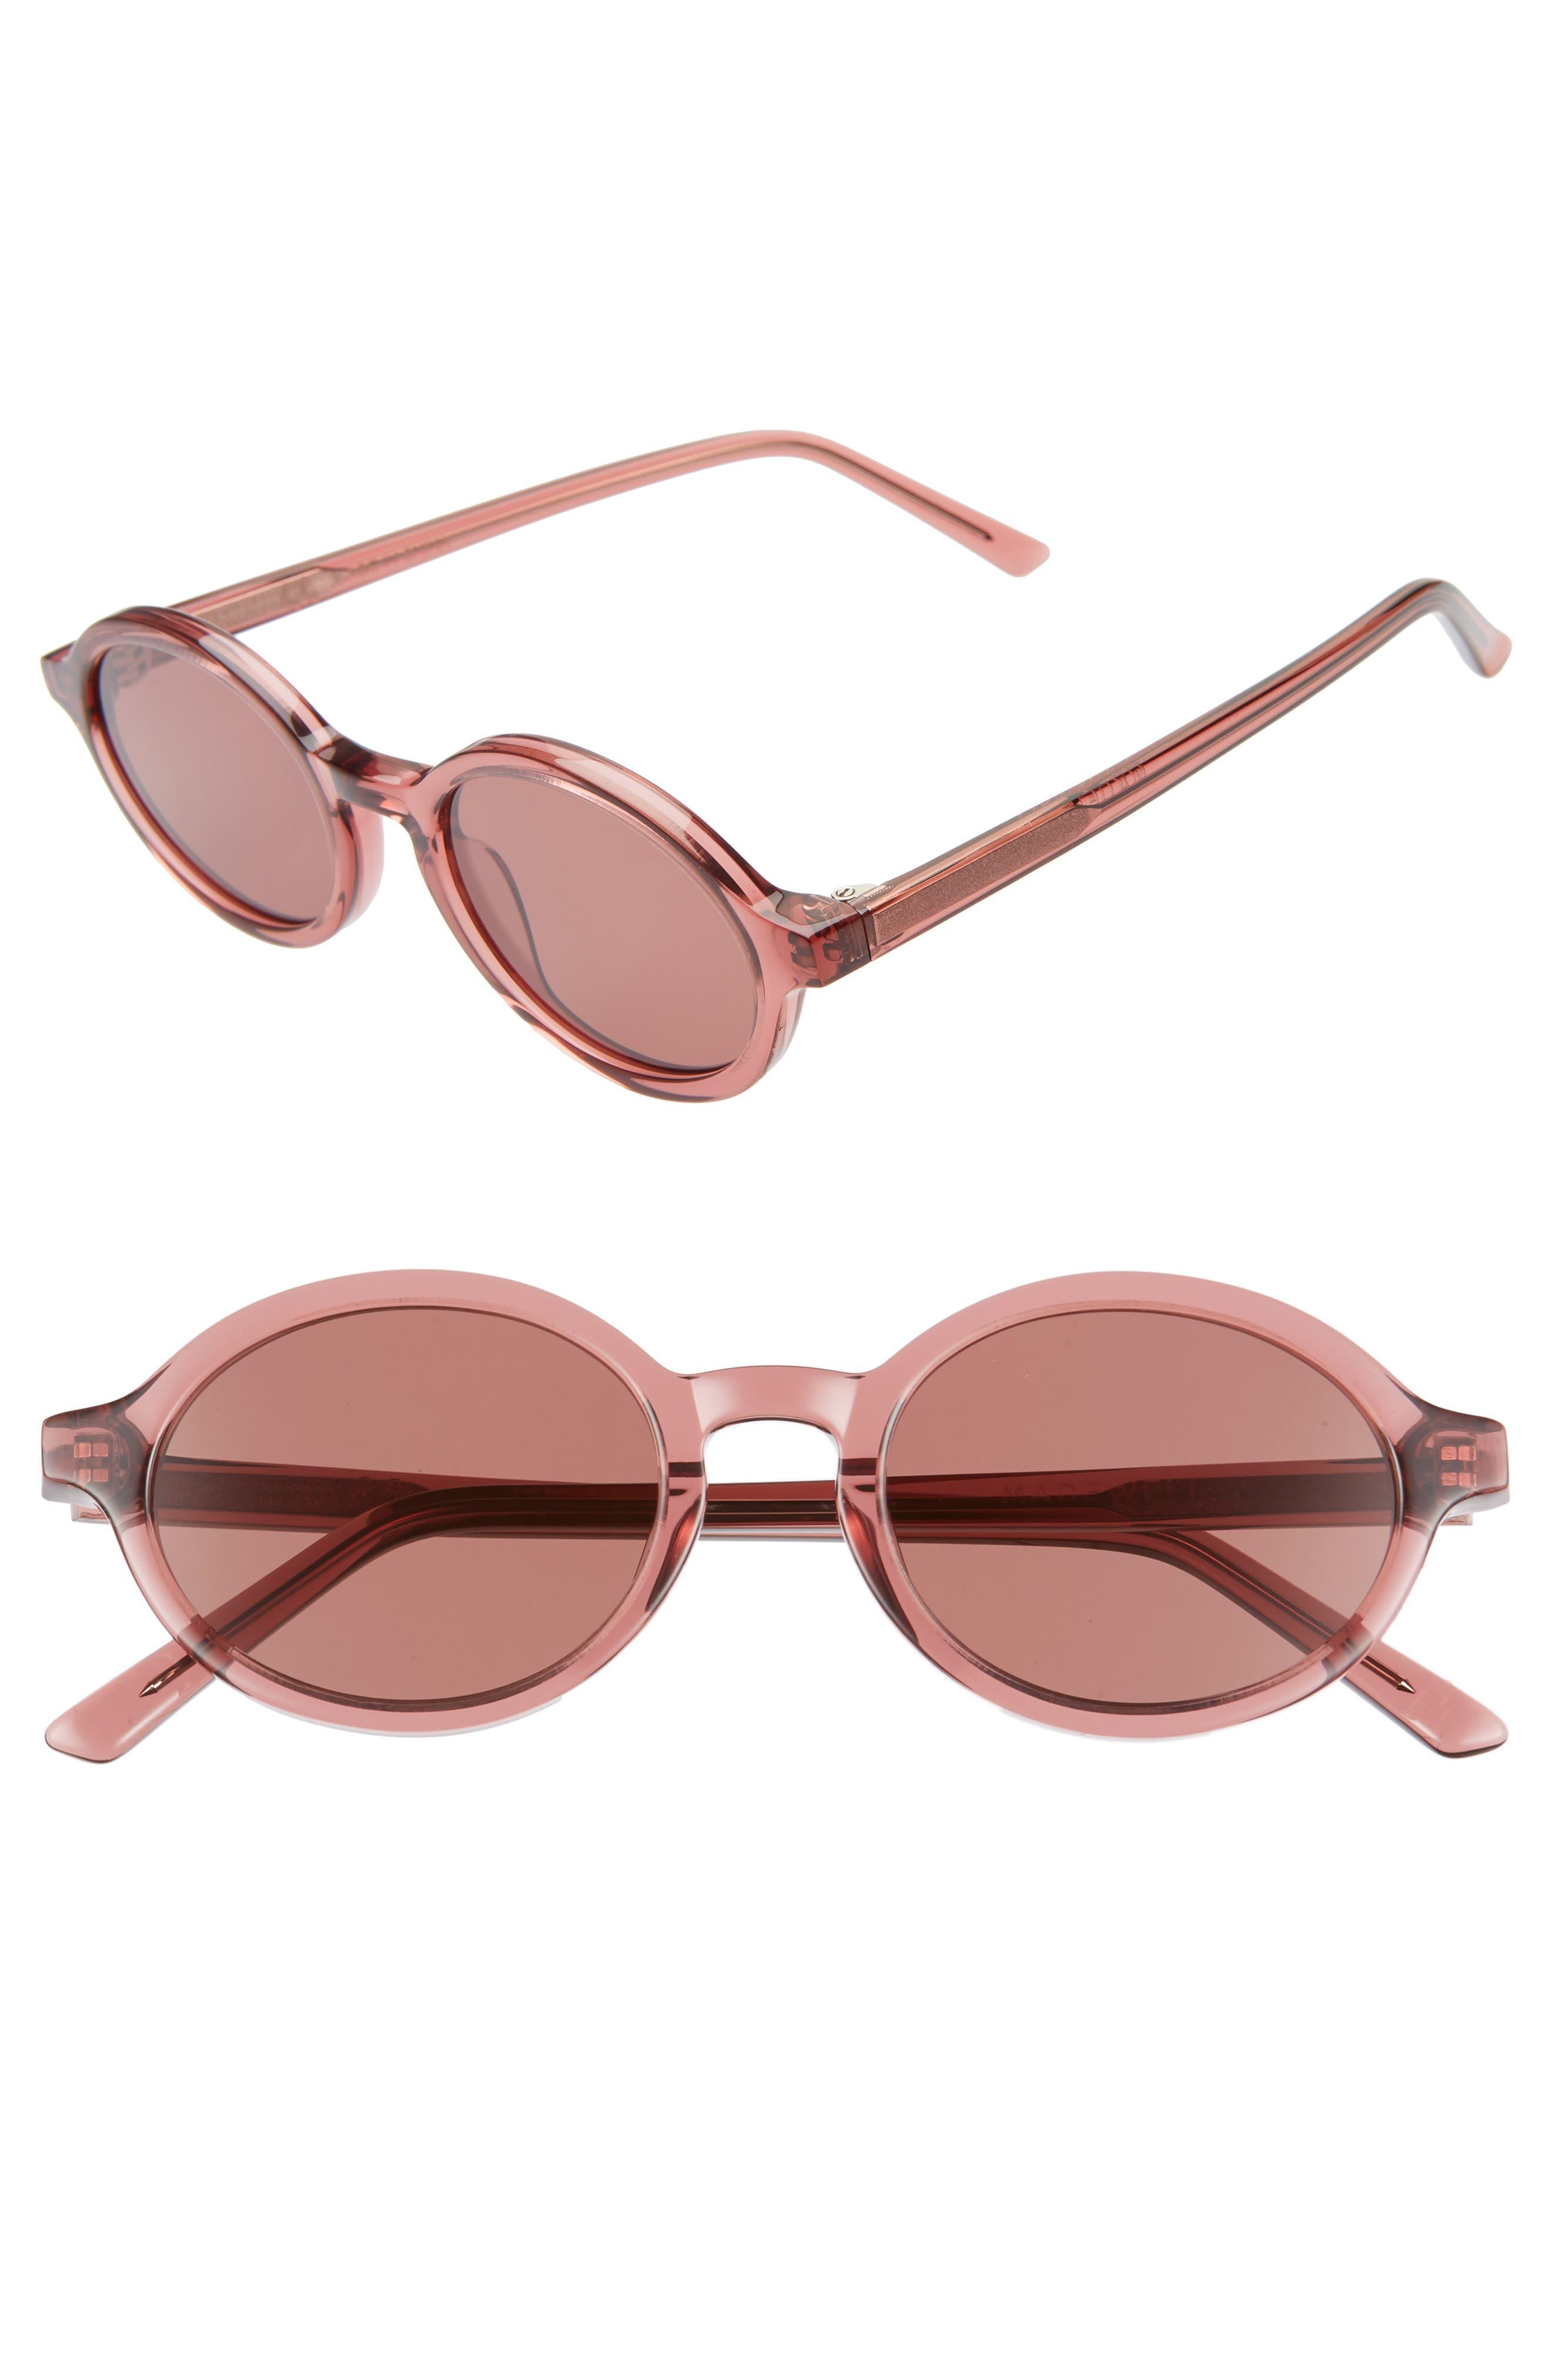 Madewell Callahan 50Mm Oval Sunglasses - Cabernet Glass